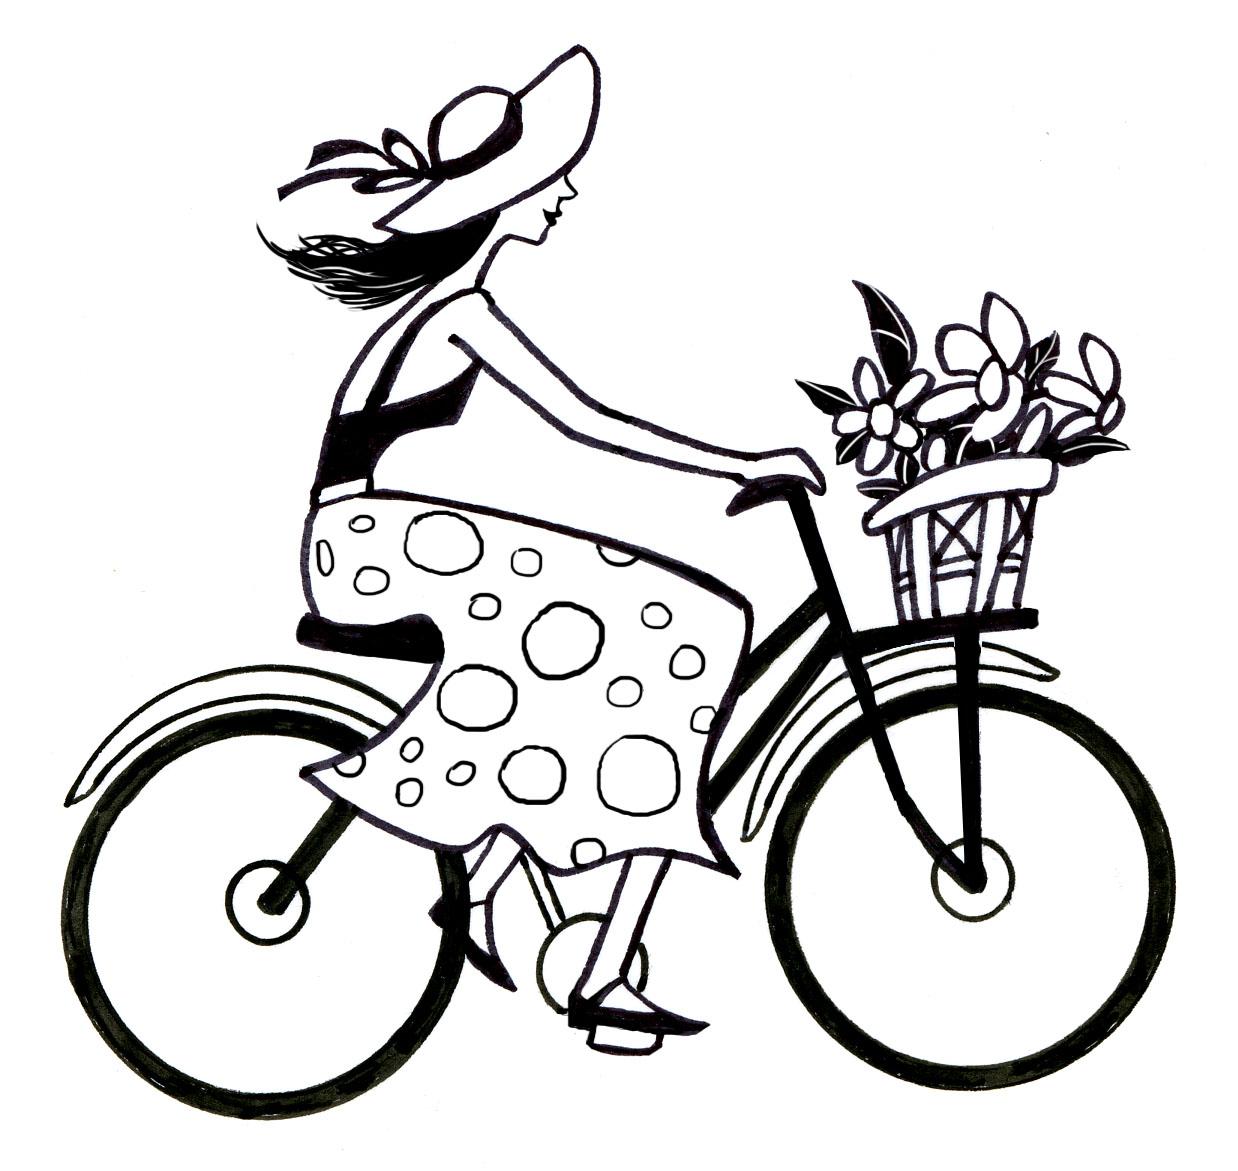 Drawn bike bike riding Drawings — by a Drawings